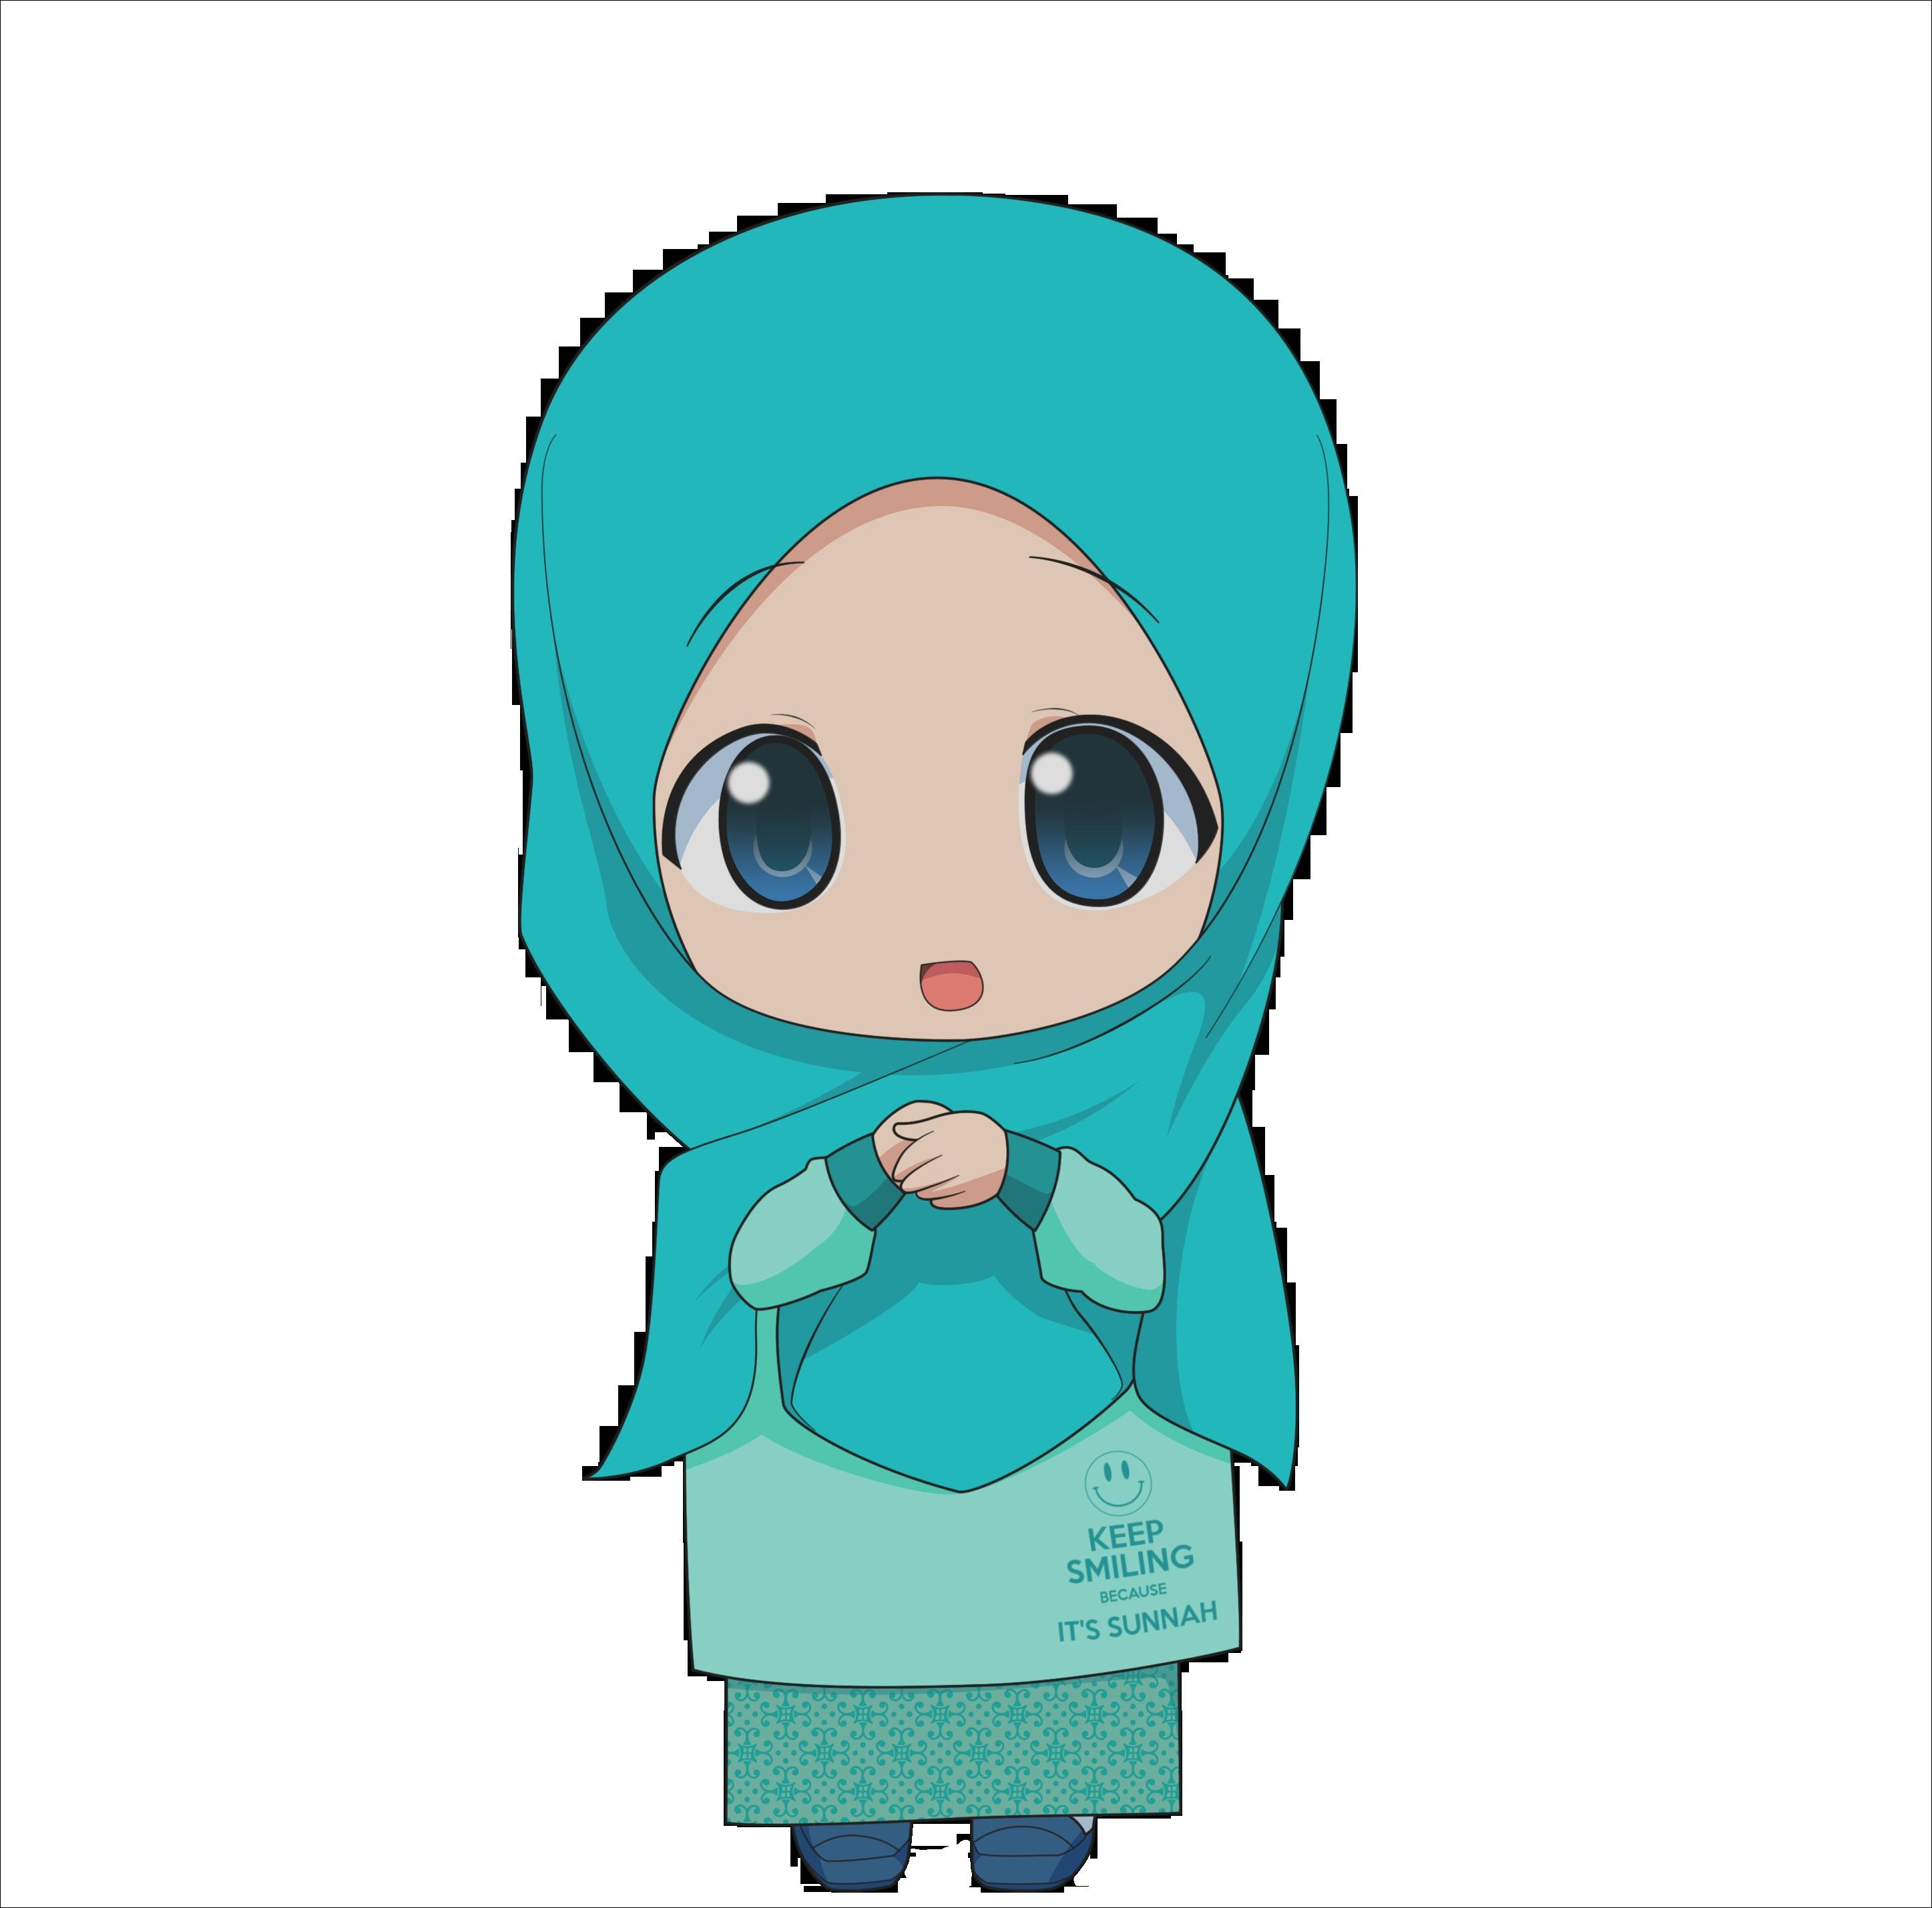 Gambar Kartun Wanita Muslimah Lucu  Galeri Kartun